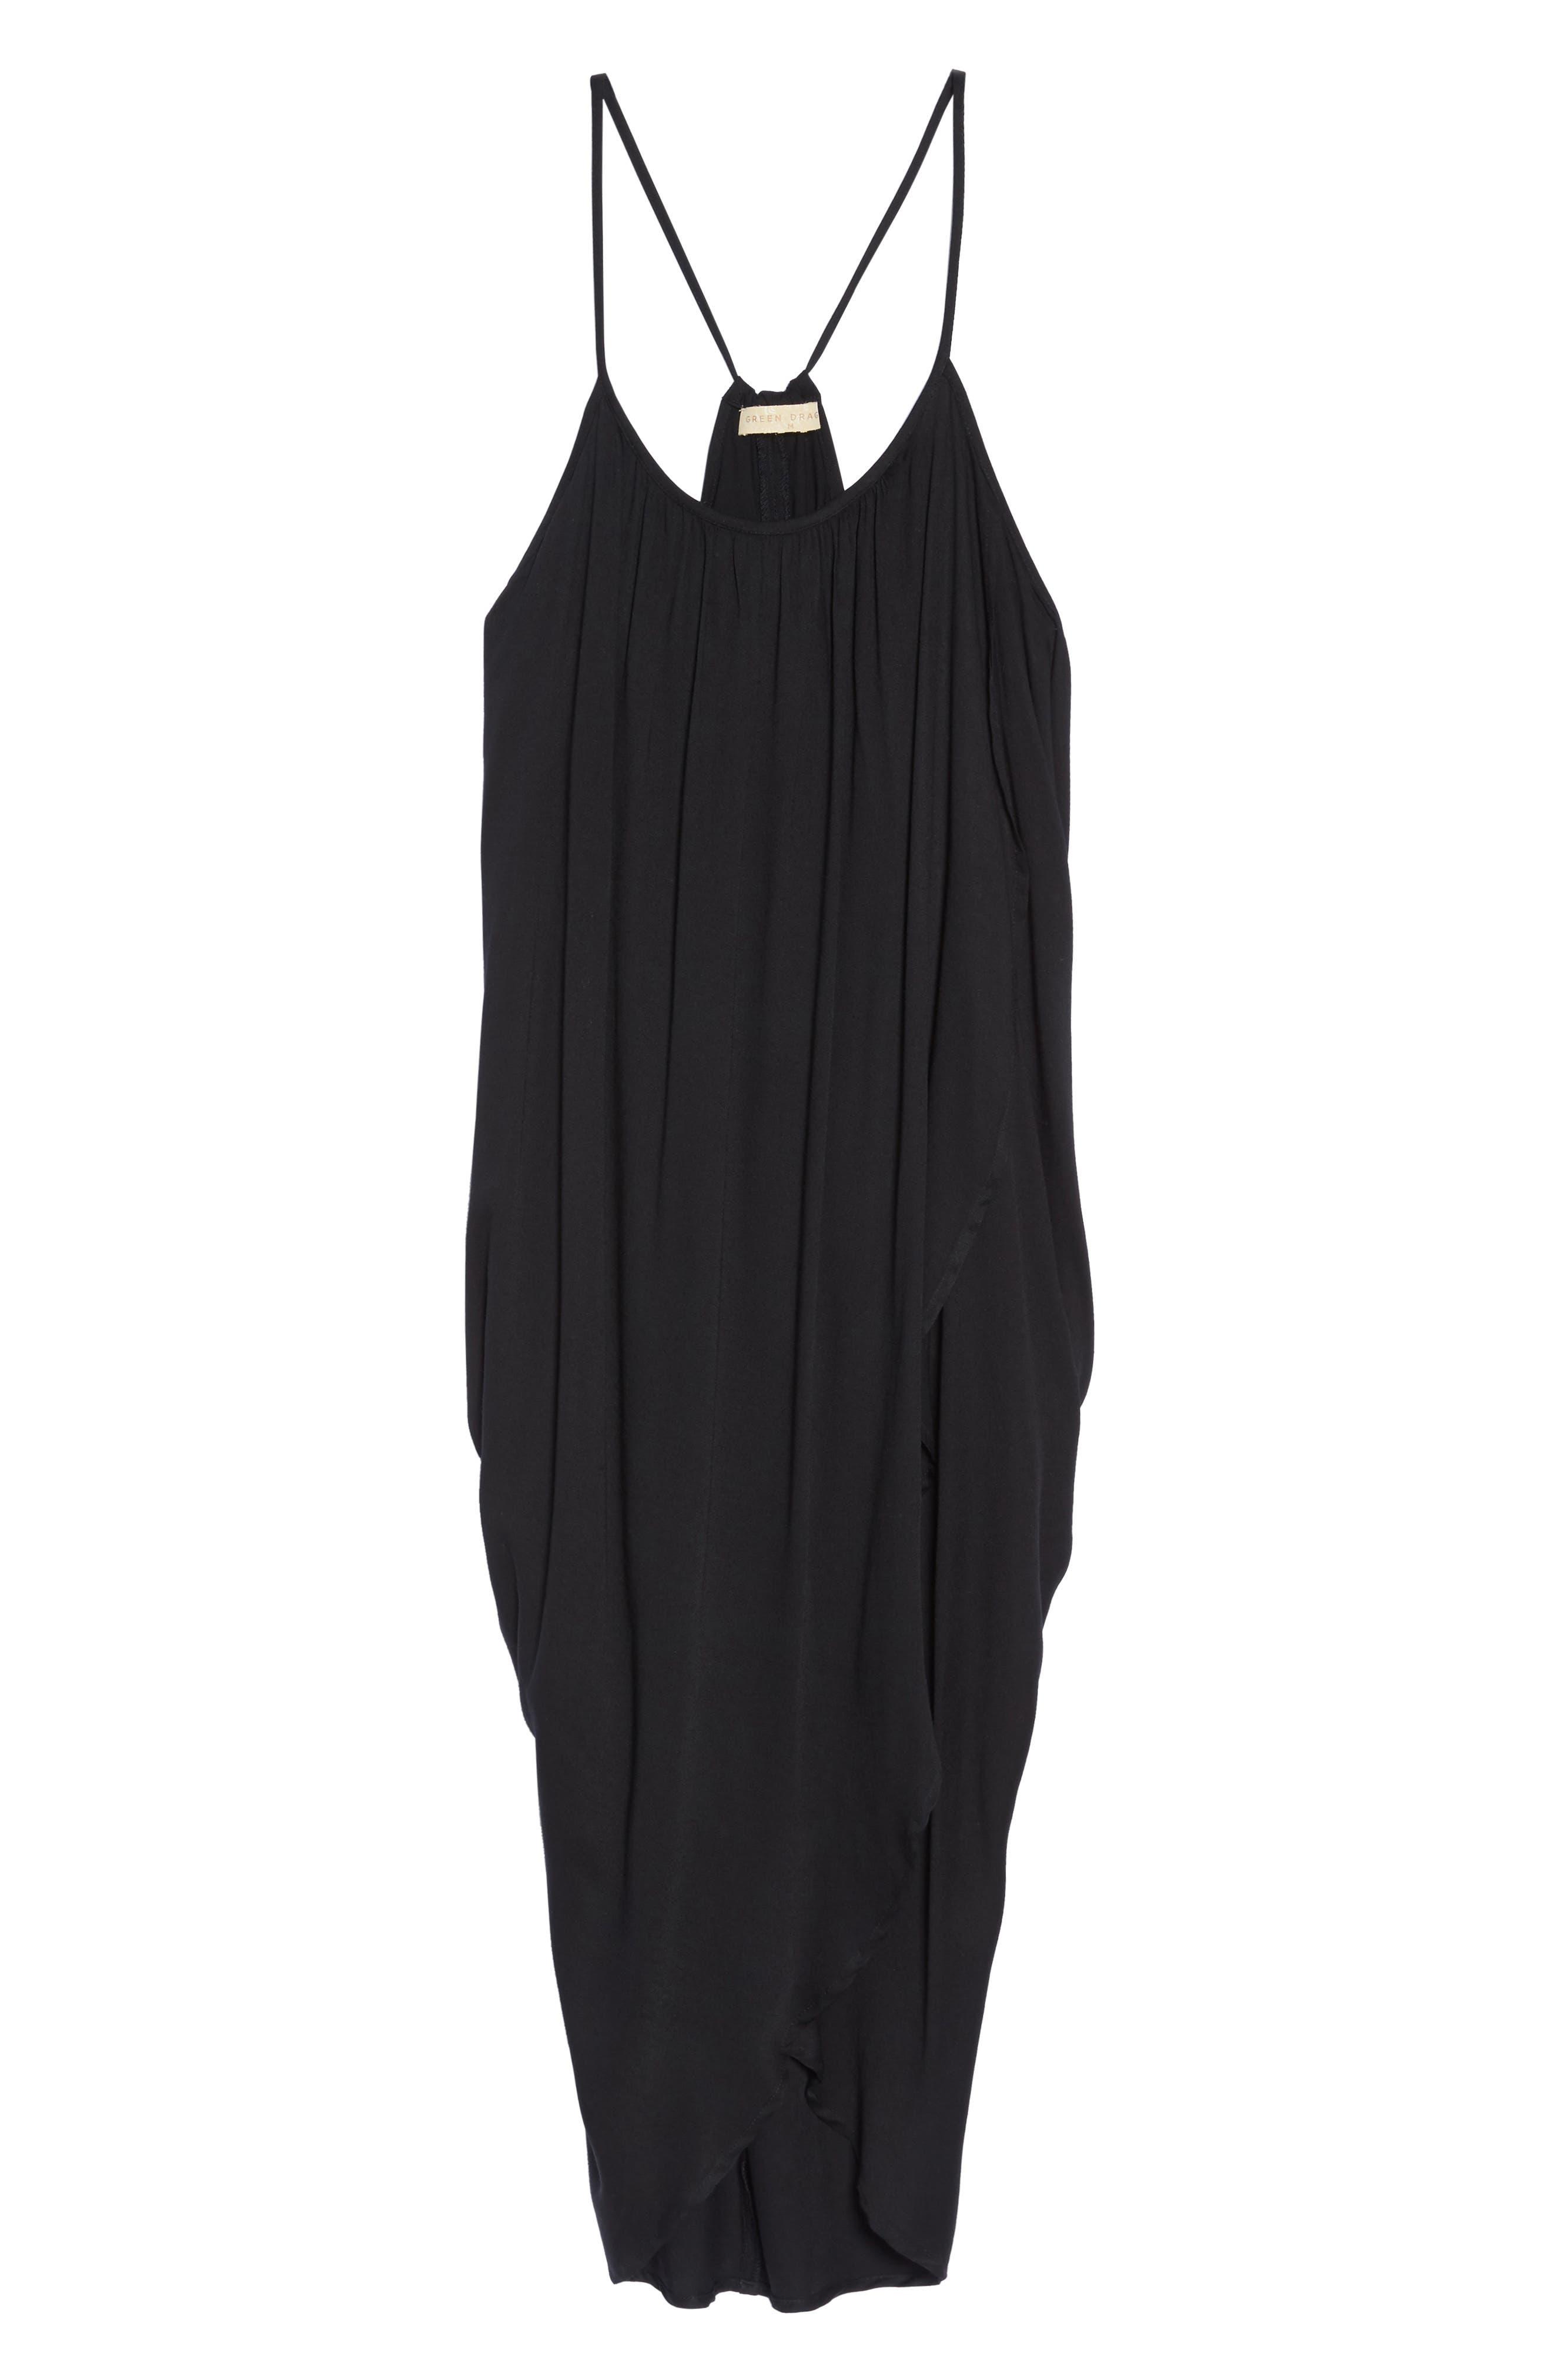 California Core Pali Wrap Cover-Up Dress,                             Alternate thumbnail 6, color,                             001